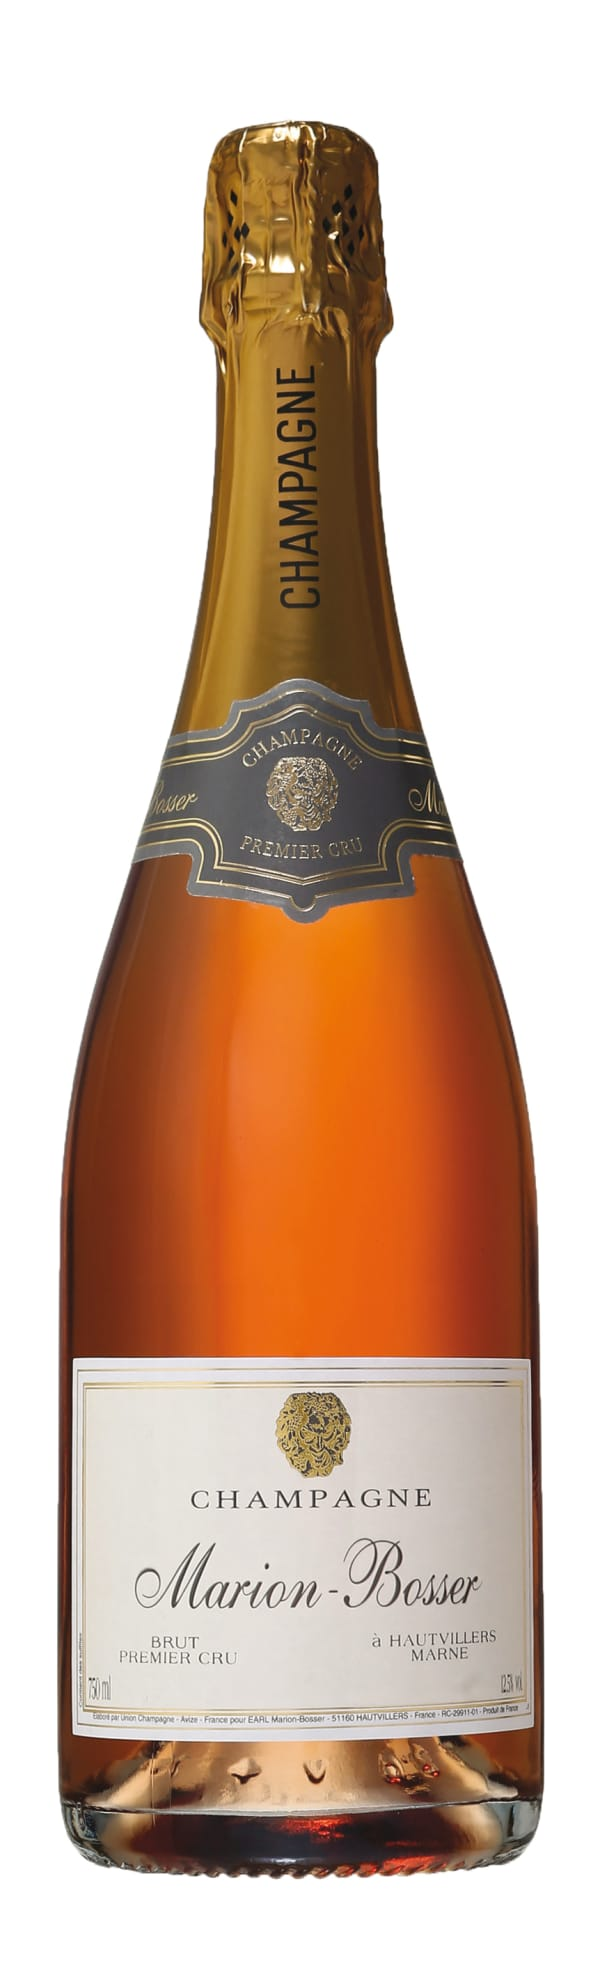 Marion-Bosser Premier Cru Rosé Champagne Brut